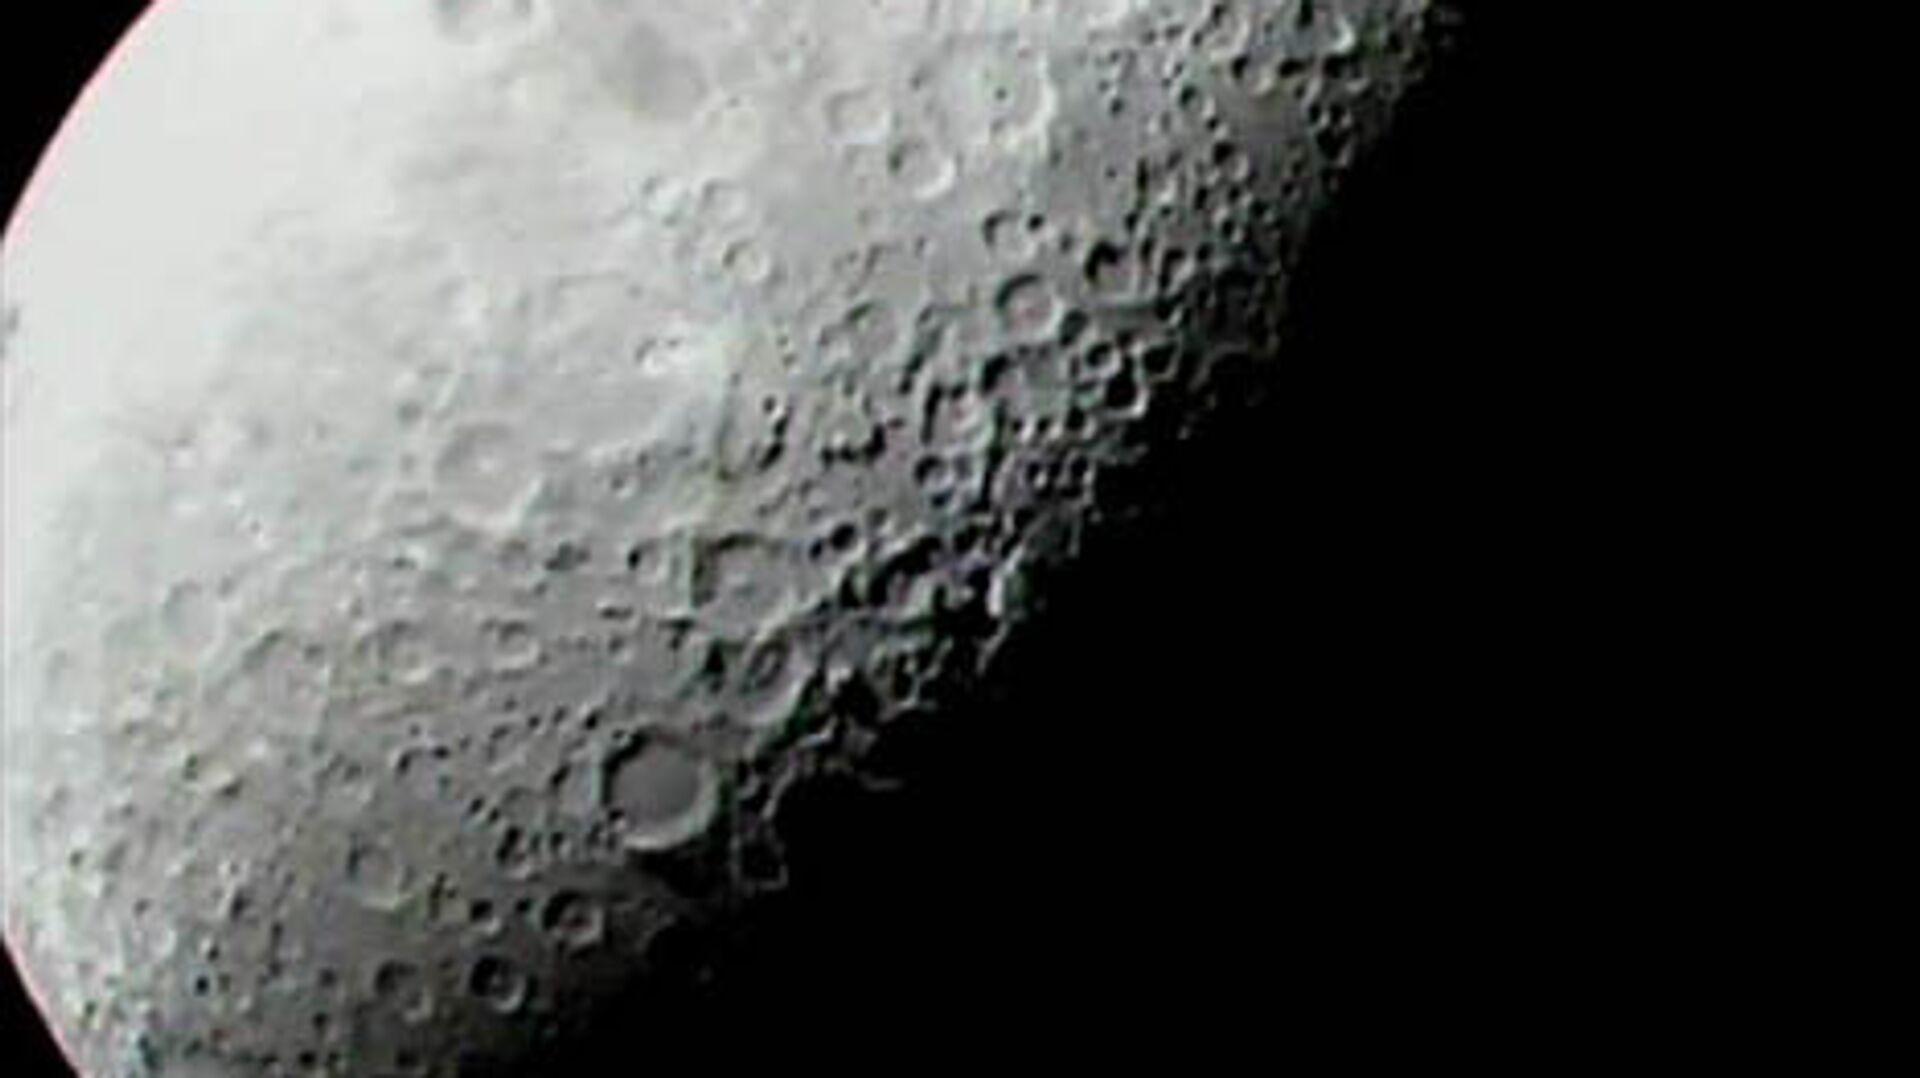 Луна - РИА Новости, 1920, 07.10.2020